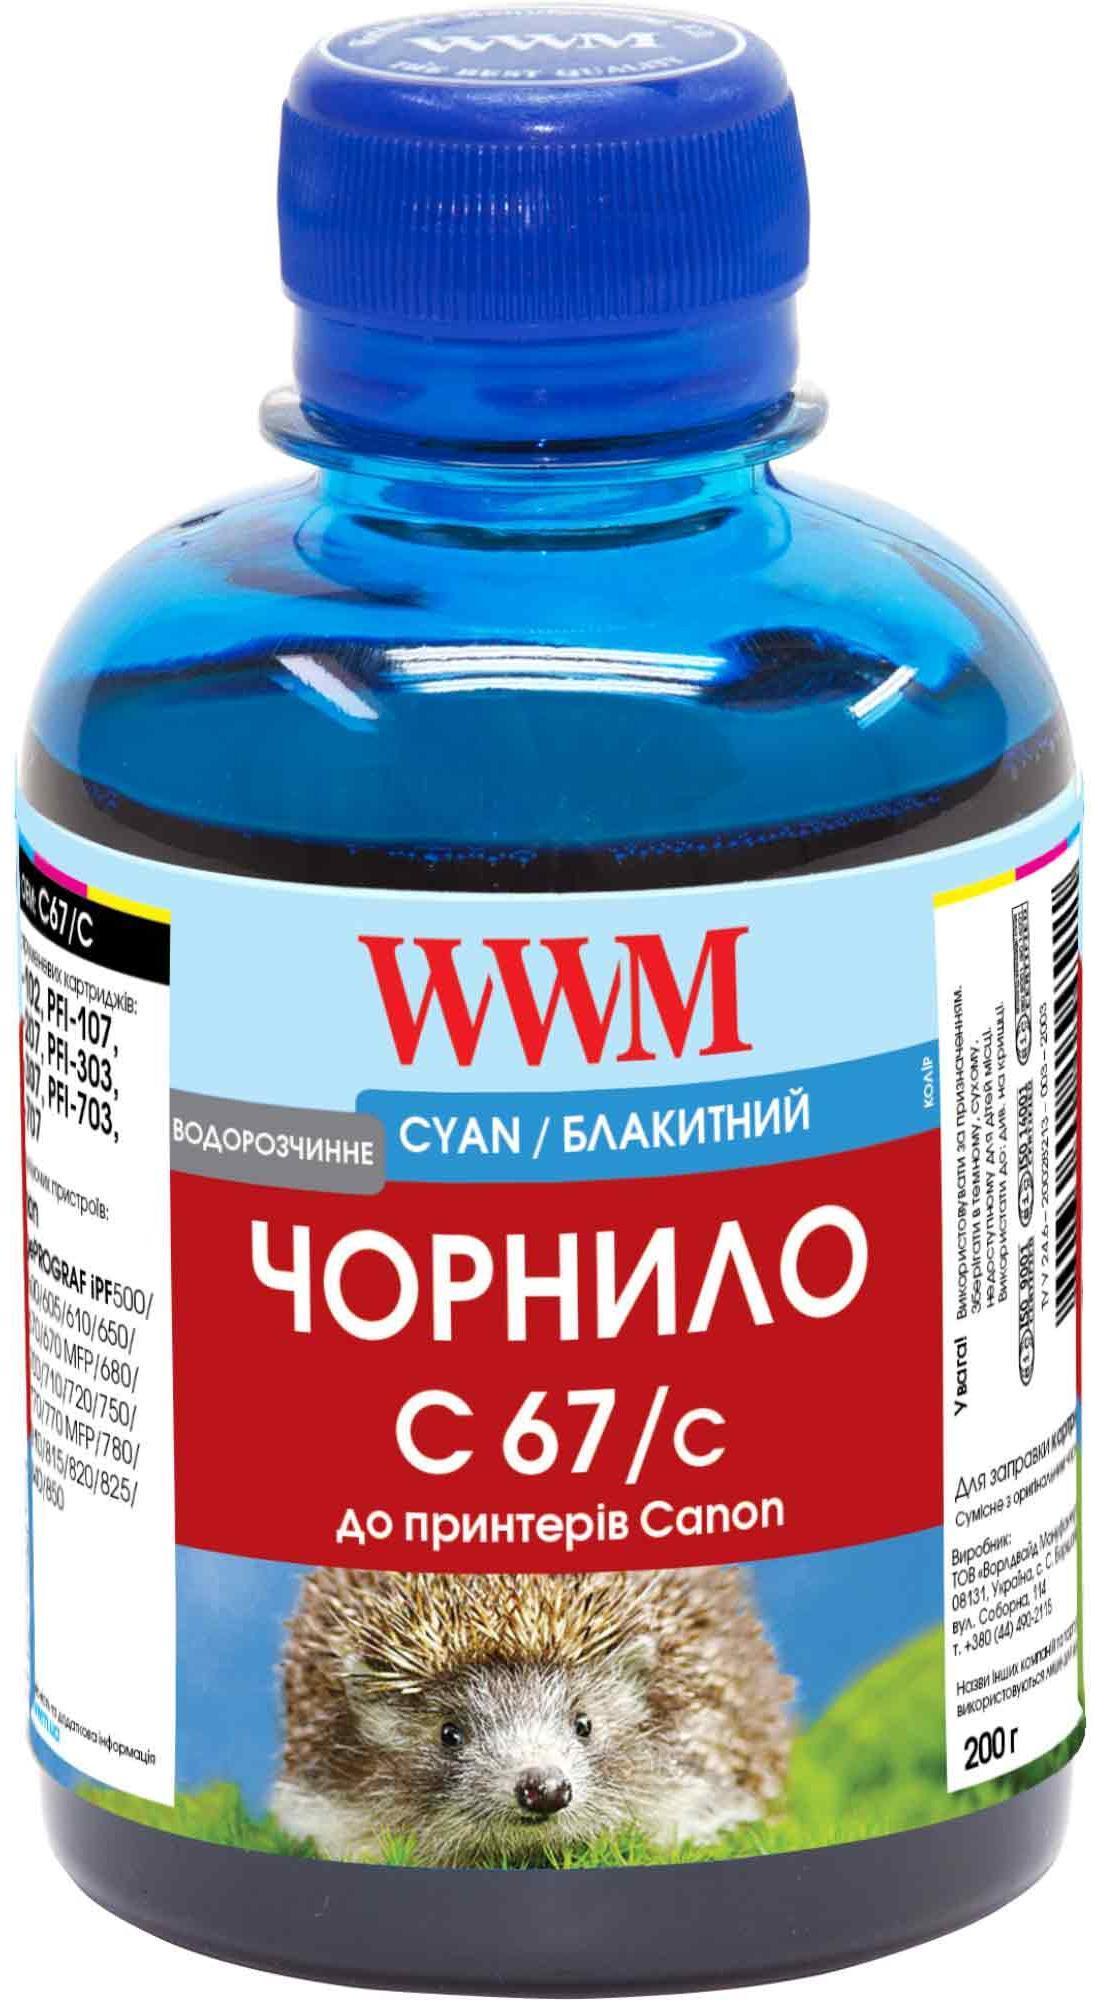 Купить Чорнило WWM for Canon IPF-107С - Cyan 200g (C67/C)